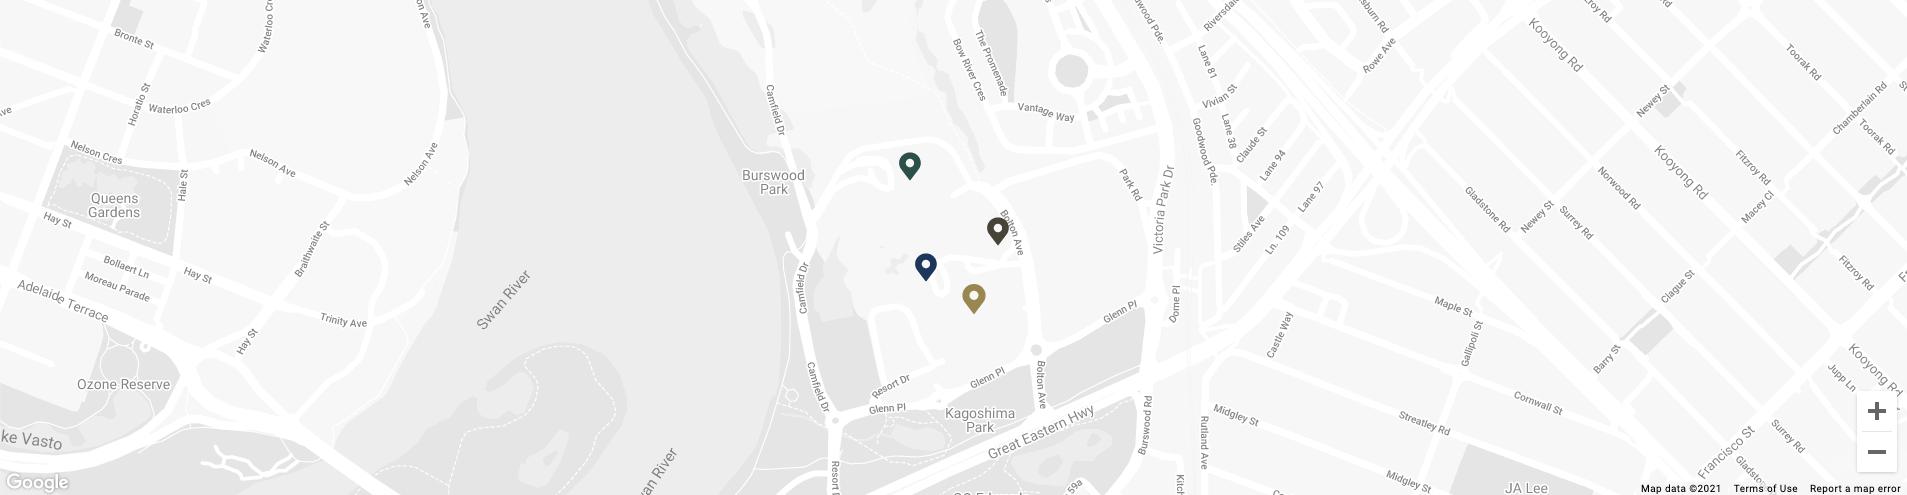 Map image of Mesh Bar